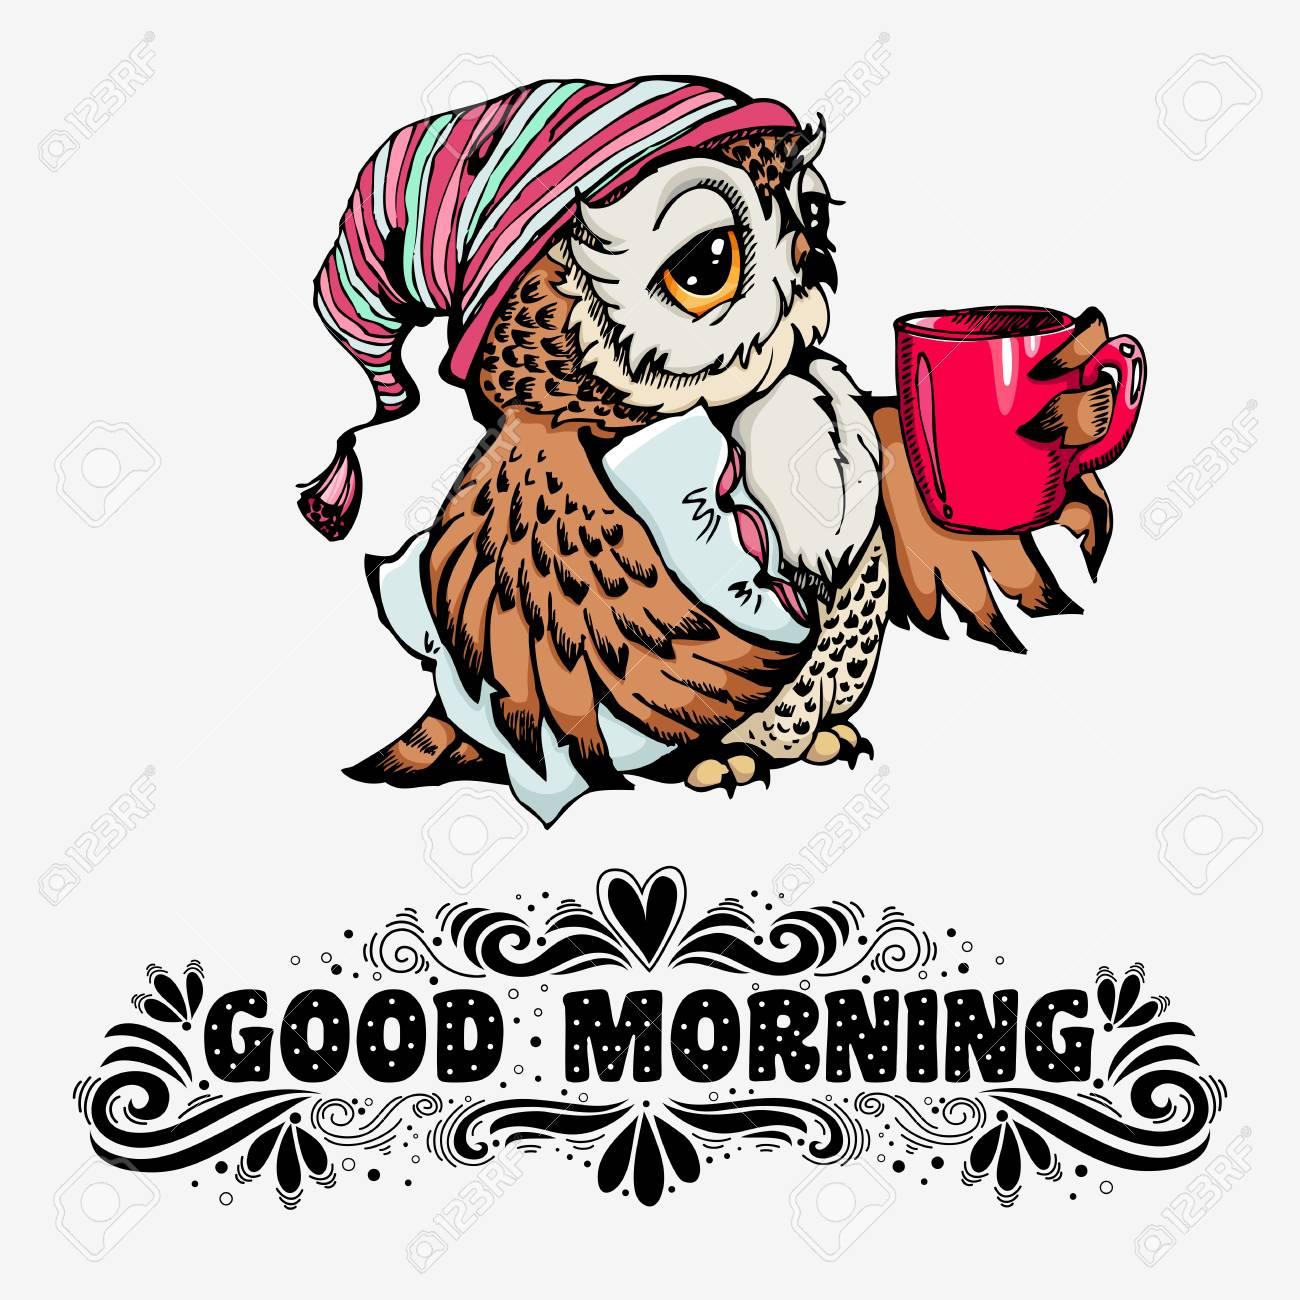 Good morning hand drawn inspirational print with text and cute good morning hand drawn inspirational print with text and cute owl character for t m4hsunfo